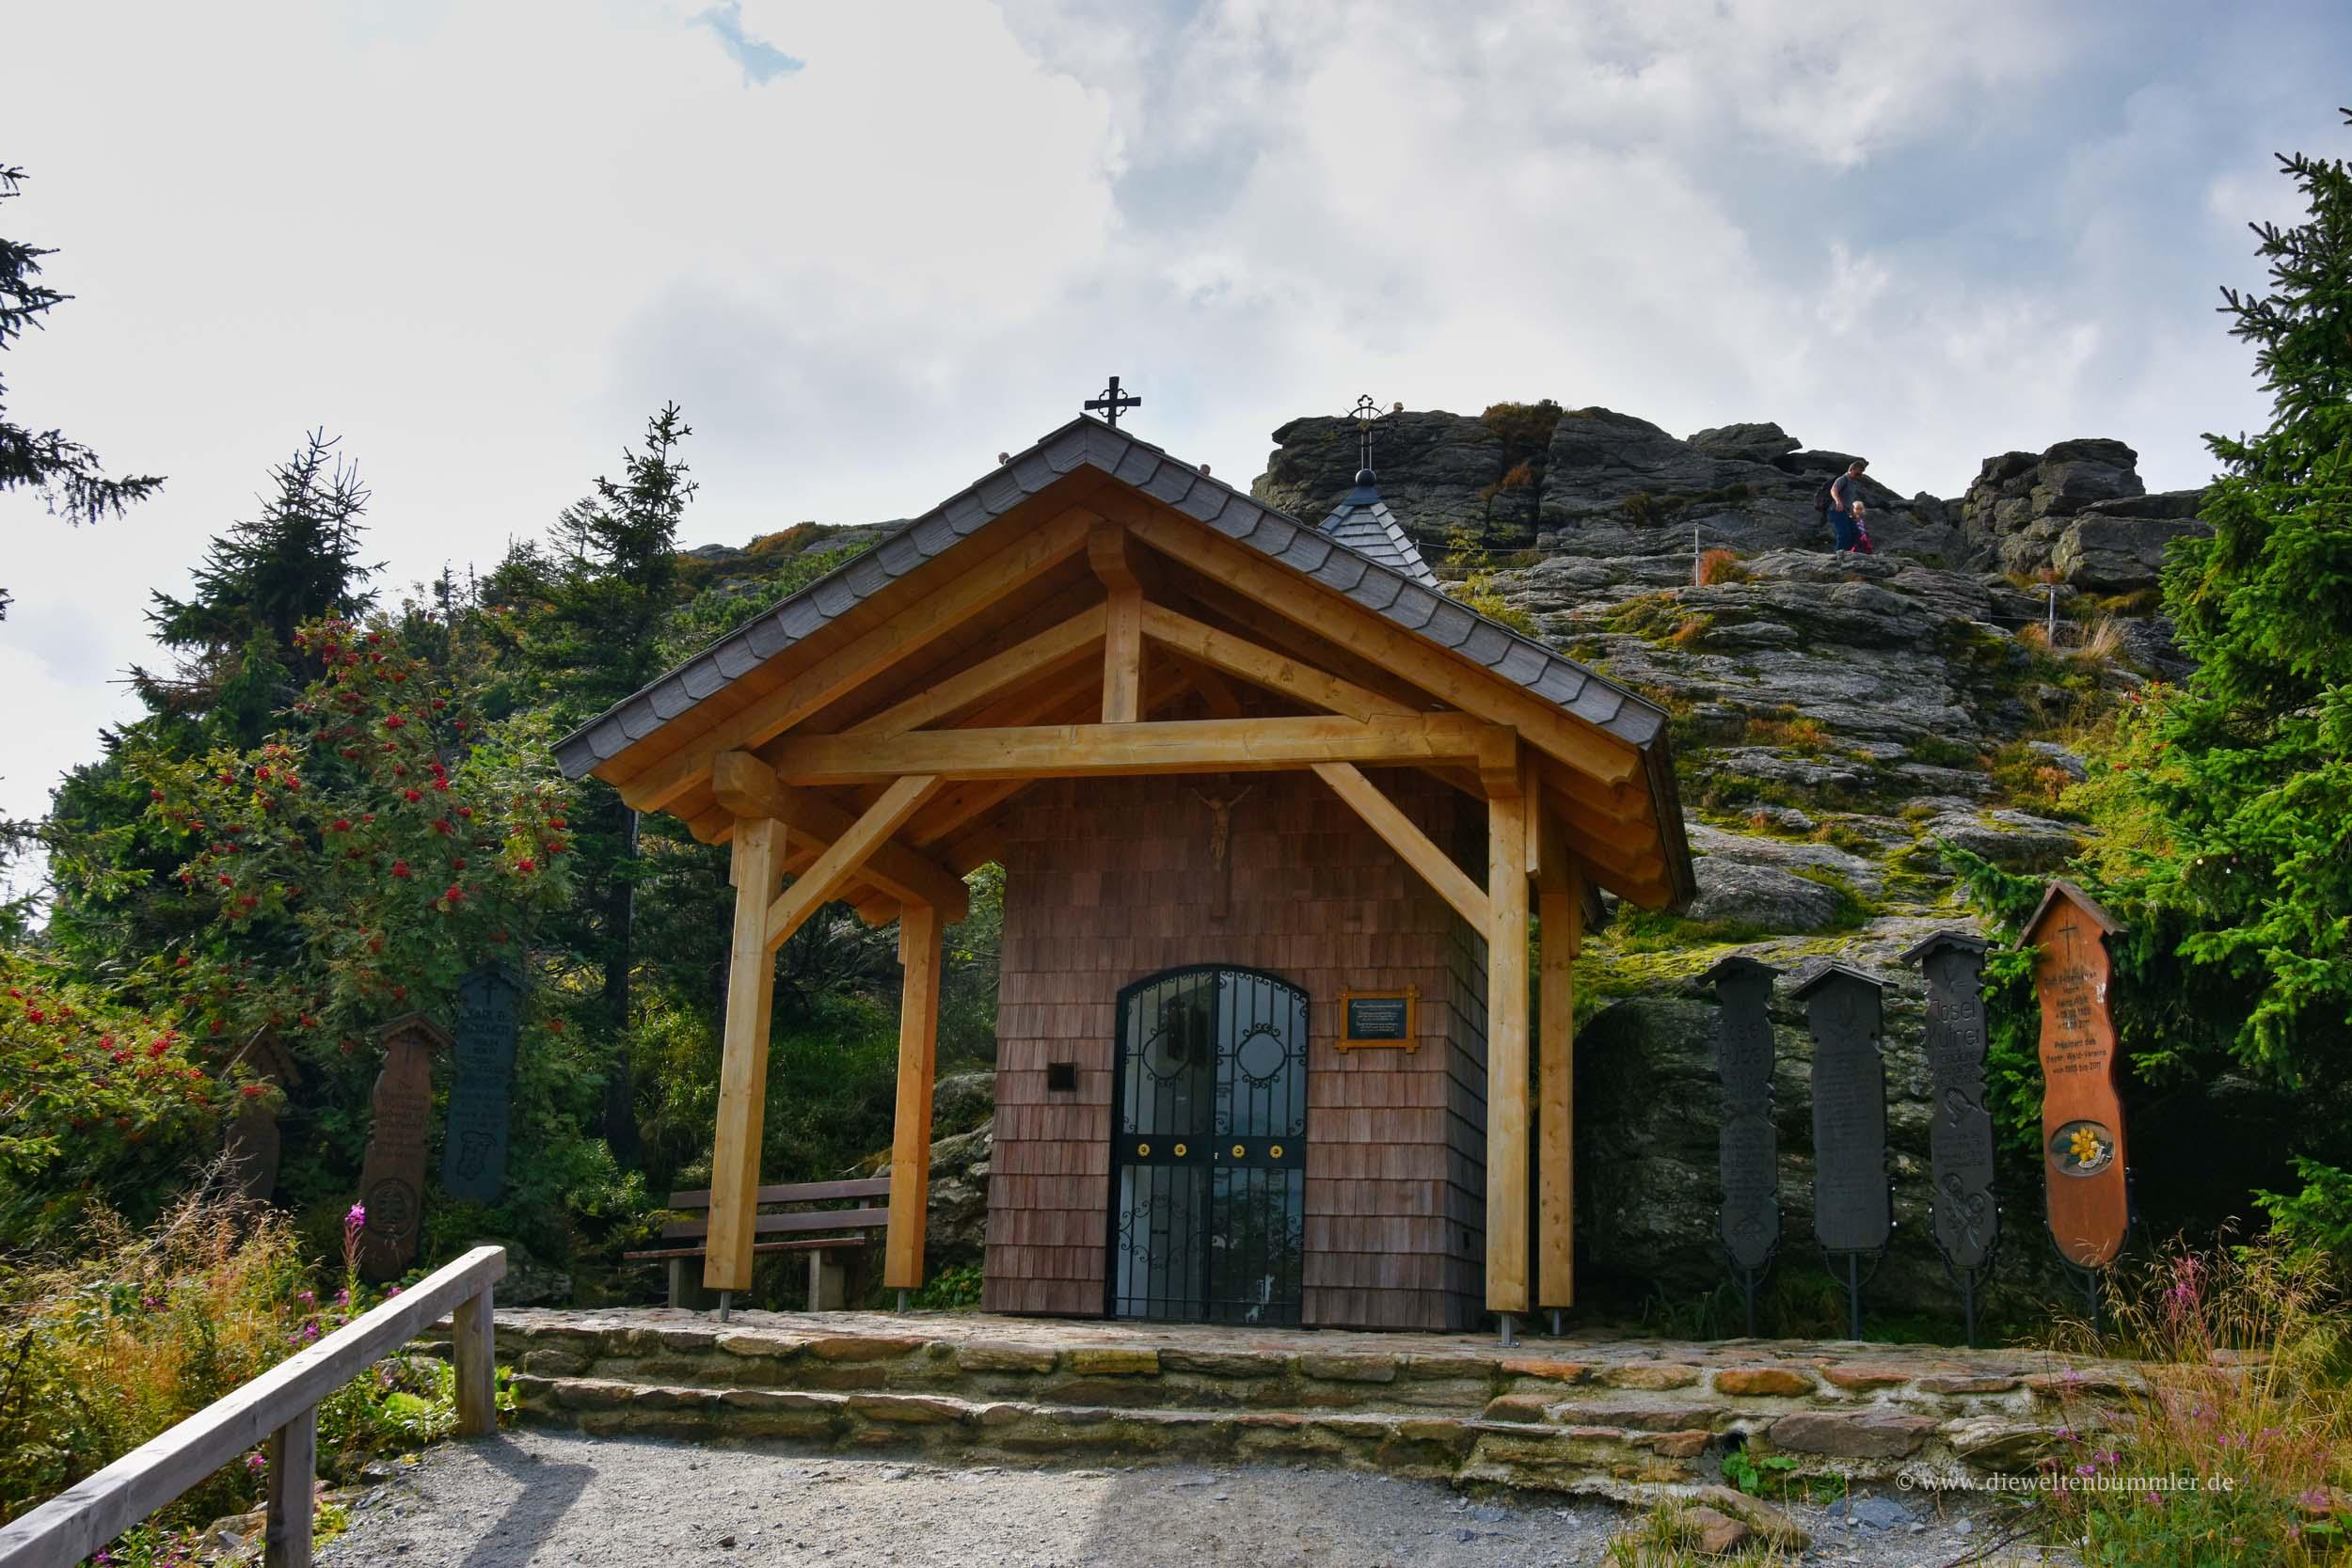 Kapelle unterhalb des Gipfels